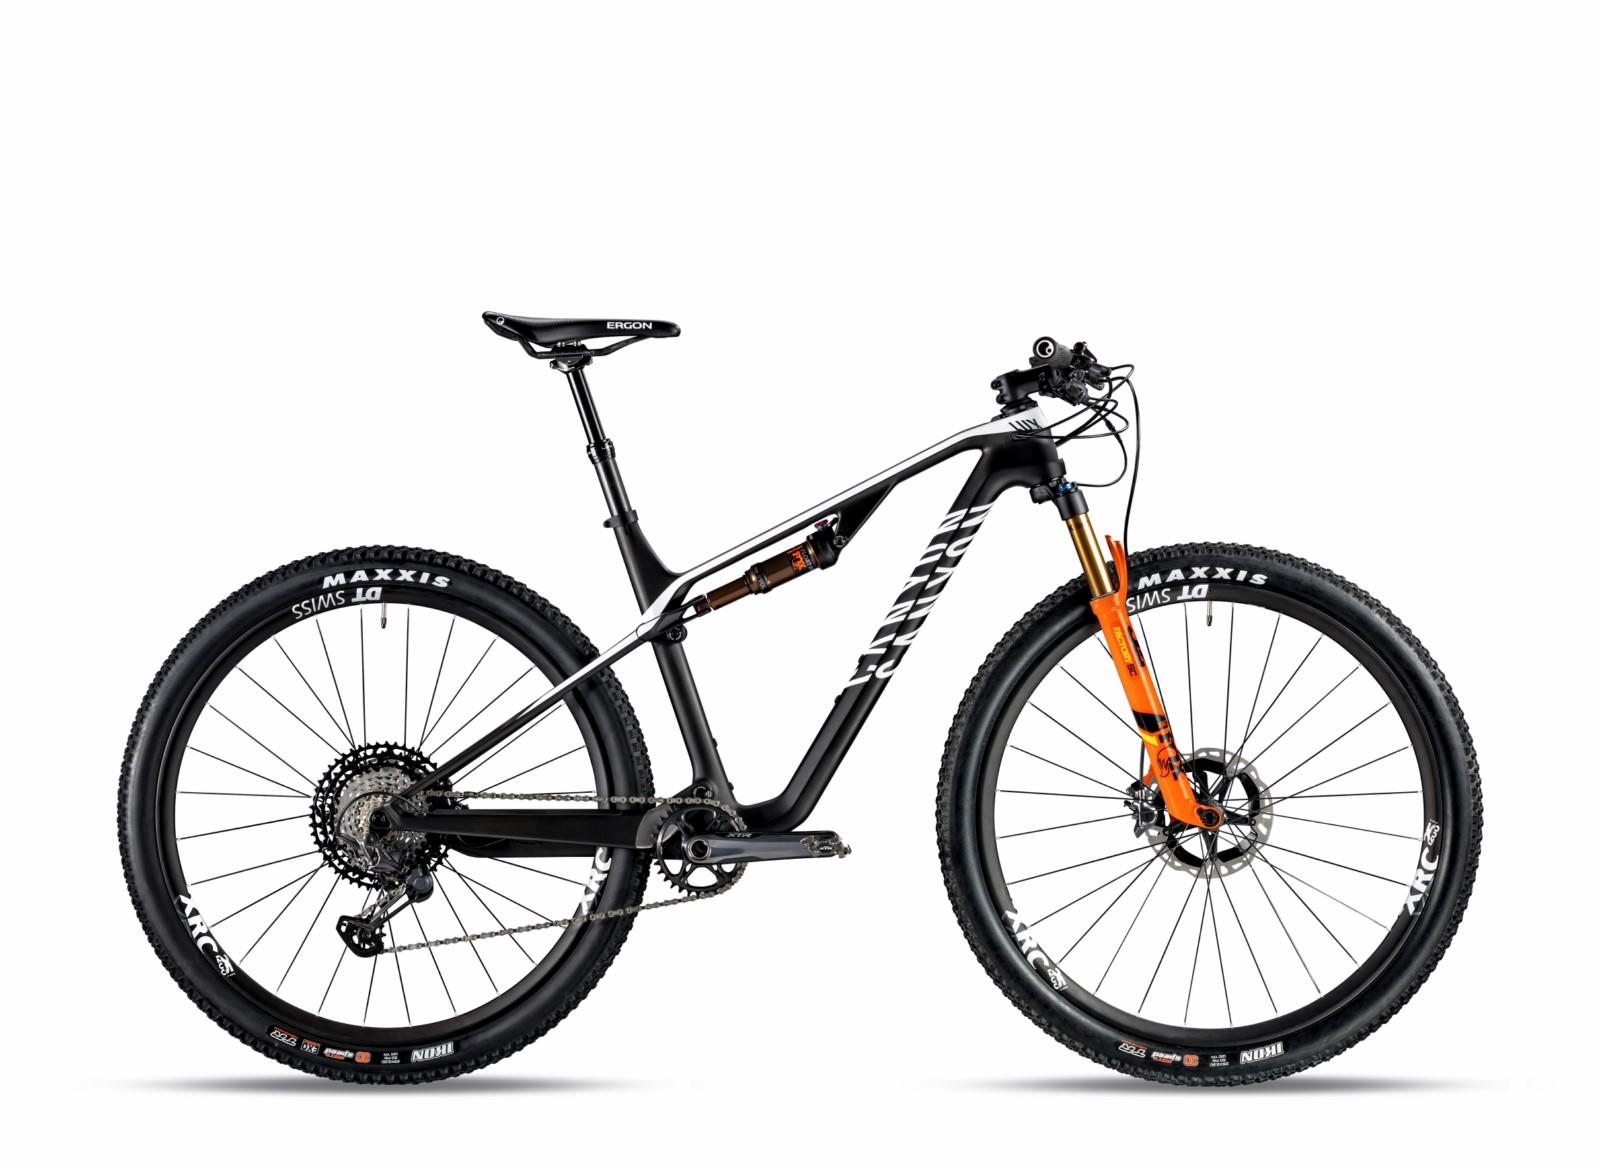 Canyon lanceert volledig herziene LUX XC-bike